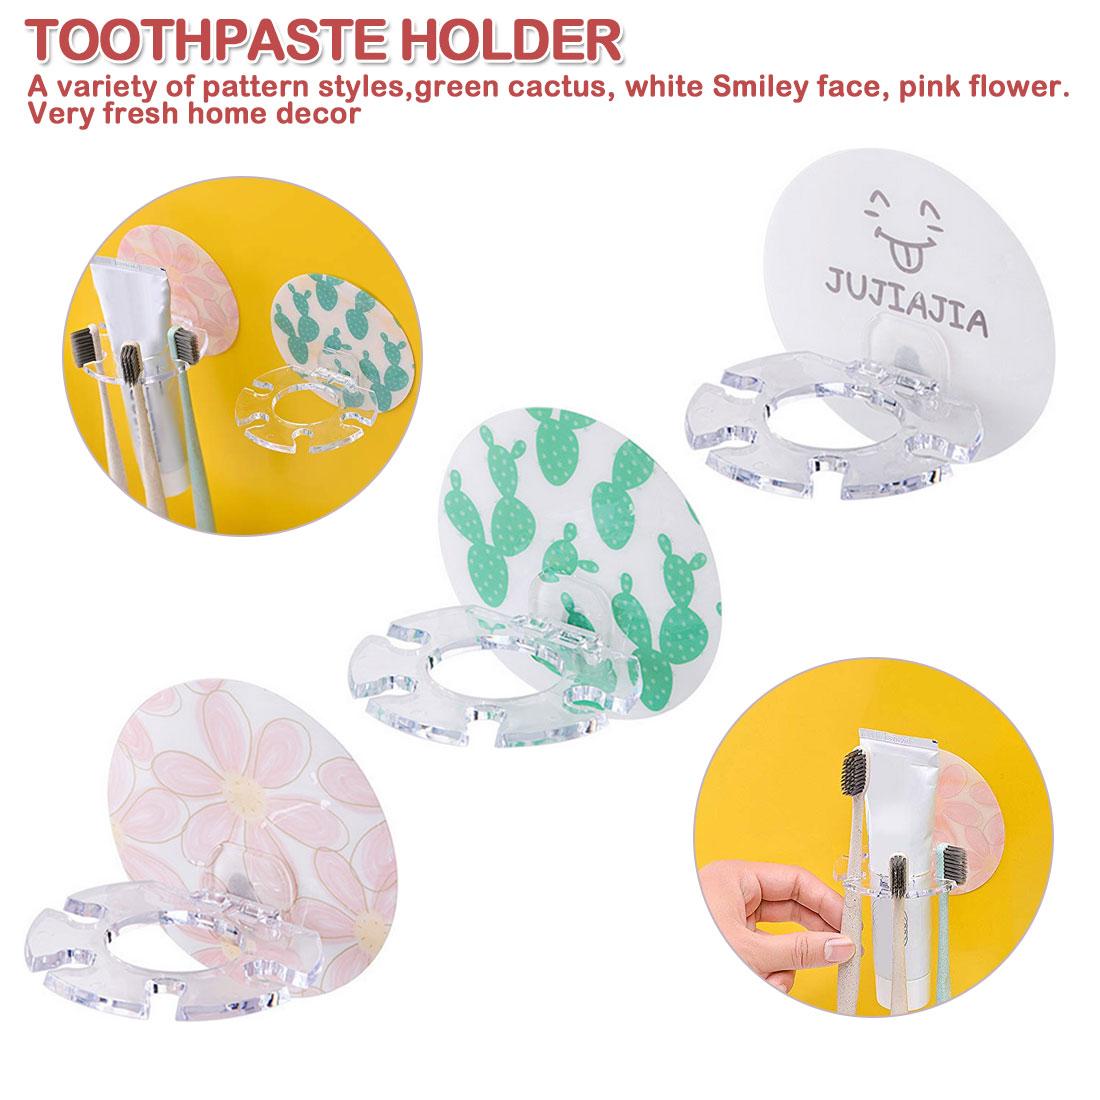 1pcs Plastic Toothbrush Holder Toothpaste Storage Rack Shaver Tooth Brush Dispenser Bathroom Organizer Accessories Tools